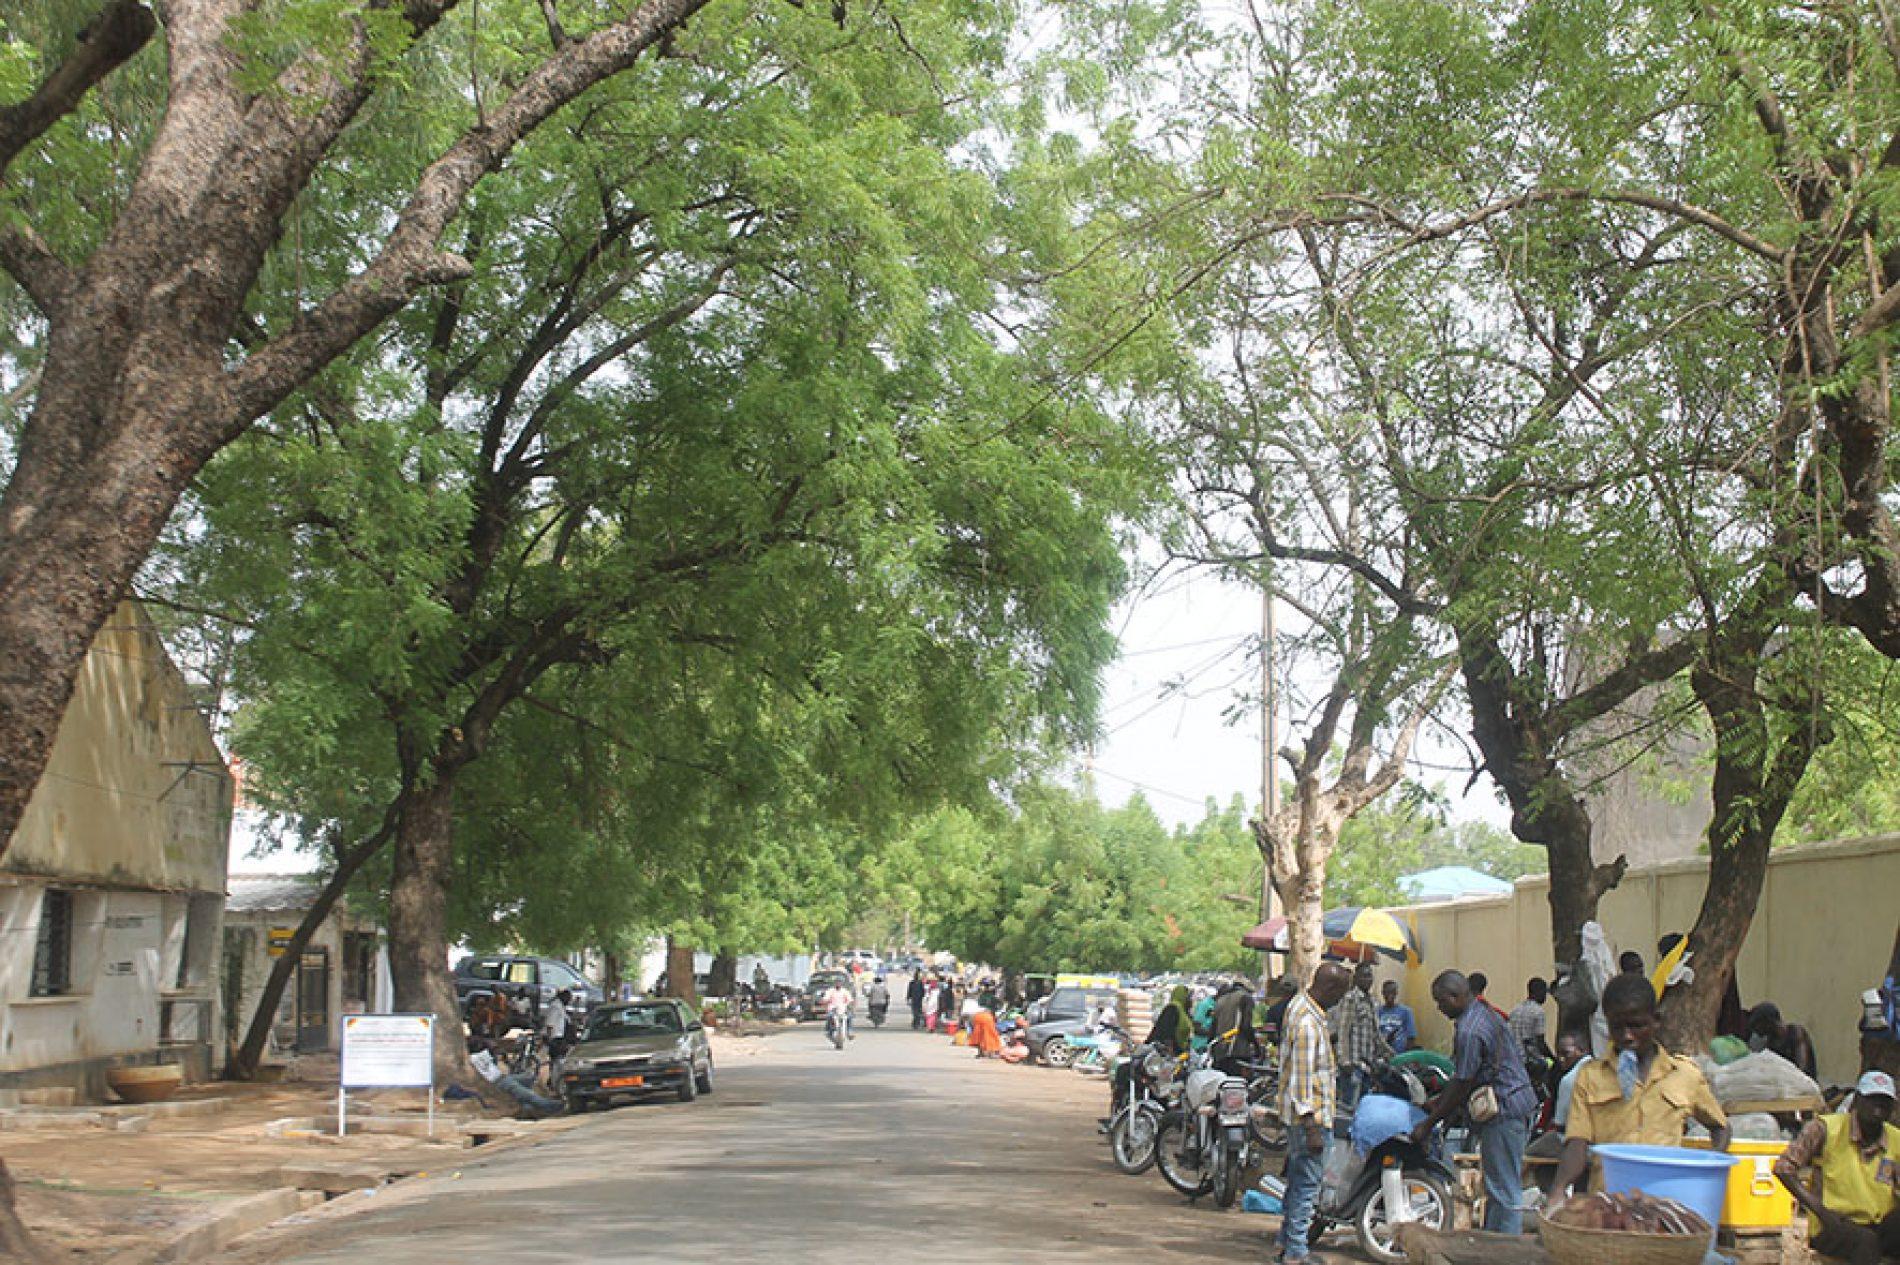 Adressage : Des figures historiques dans les rues de Garoua